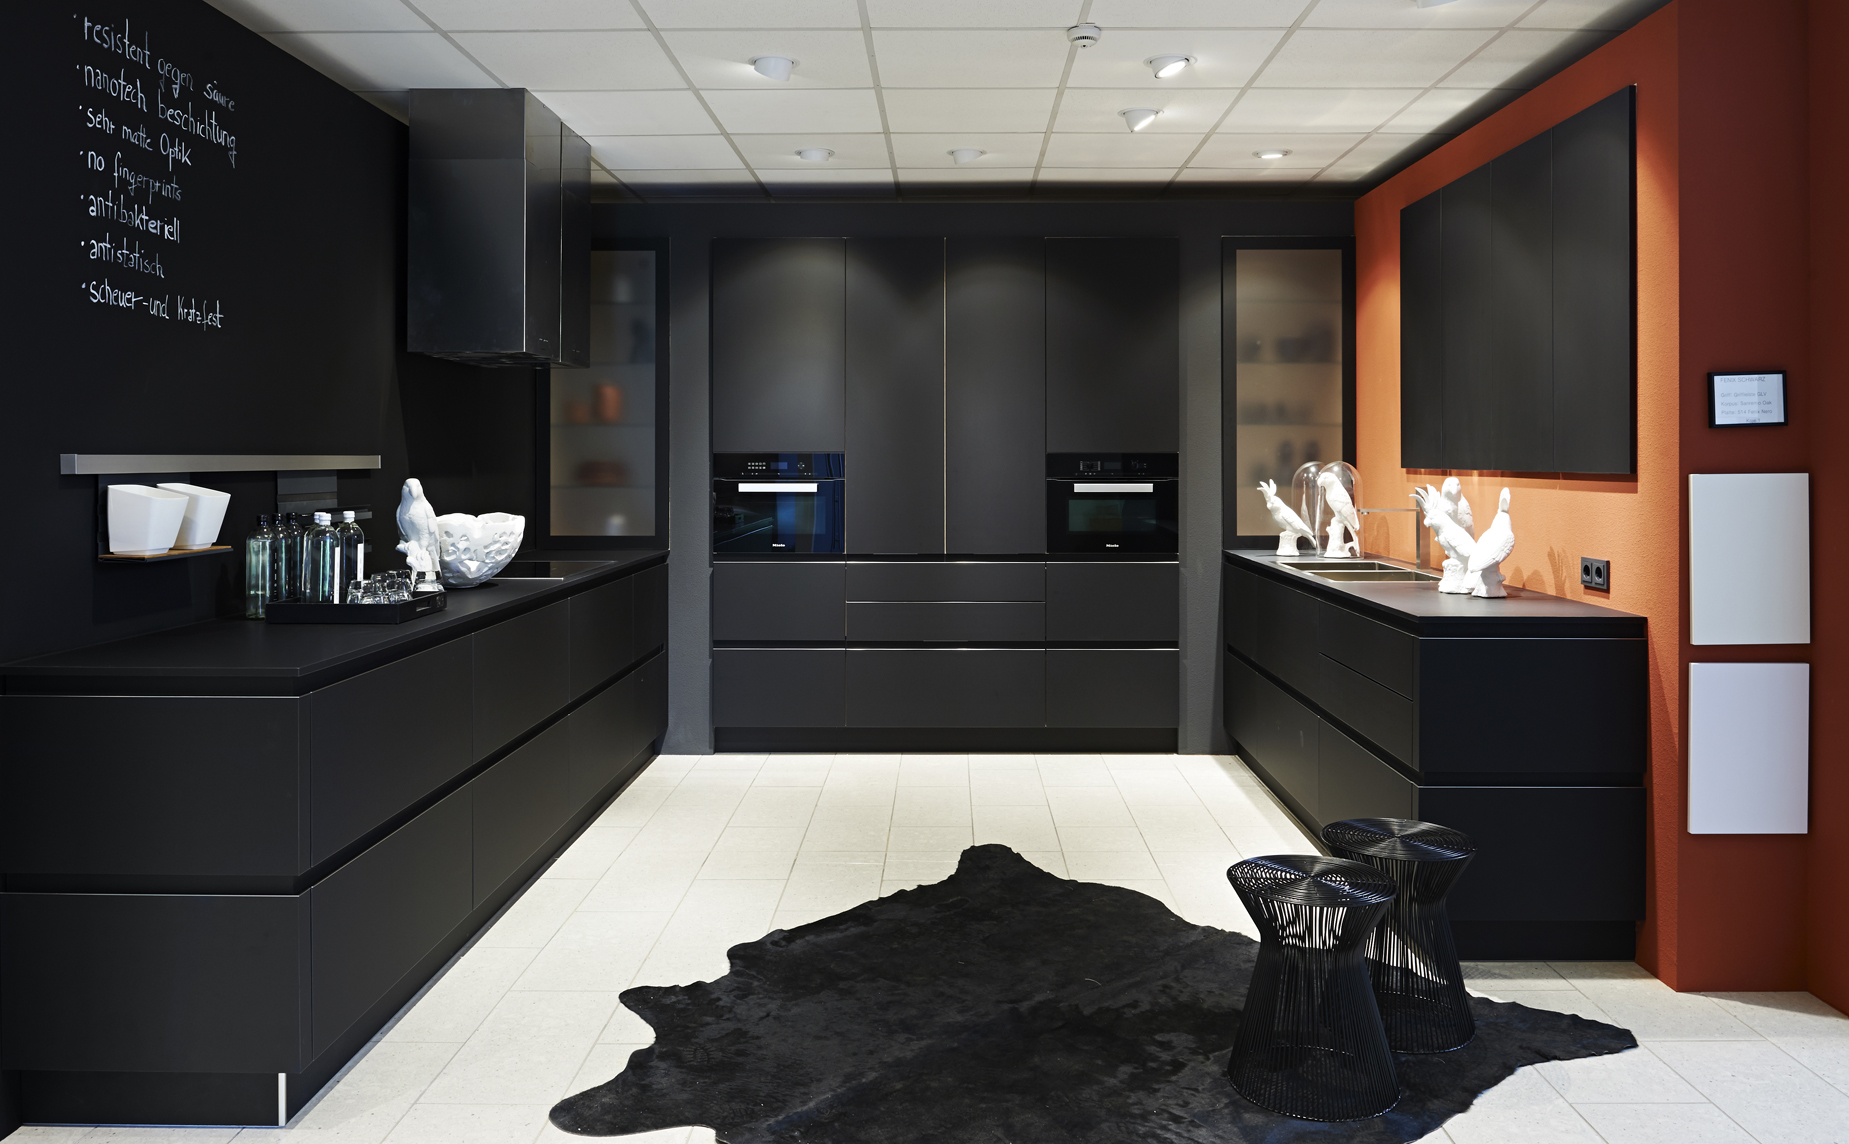 Hoogglans Keuken Zwart : Keuken mat of hoogglans affordable keuken with keuken mat of